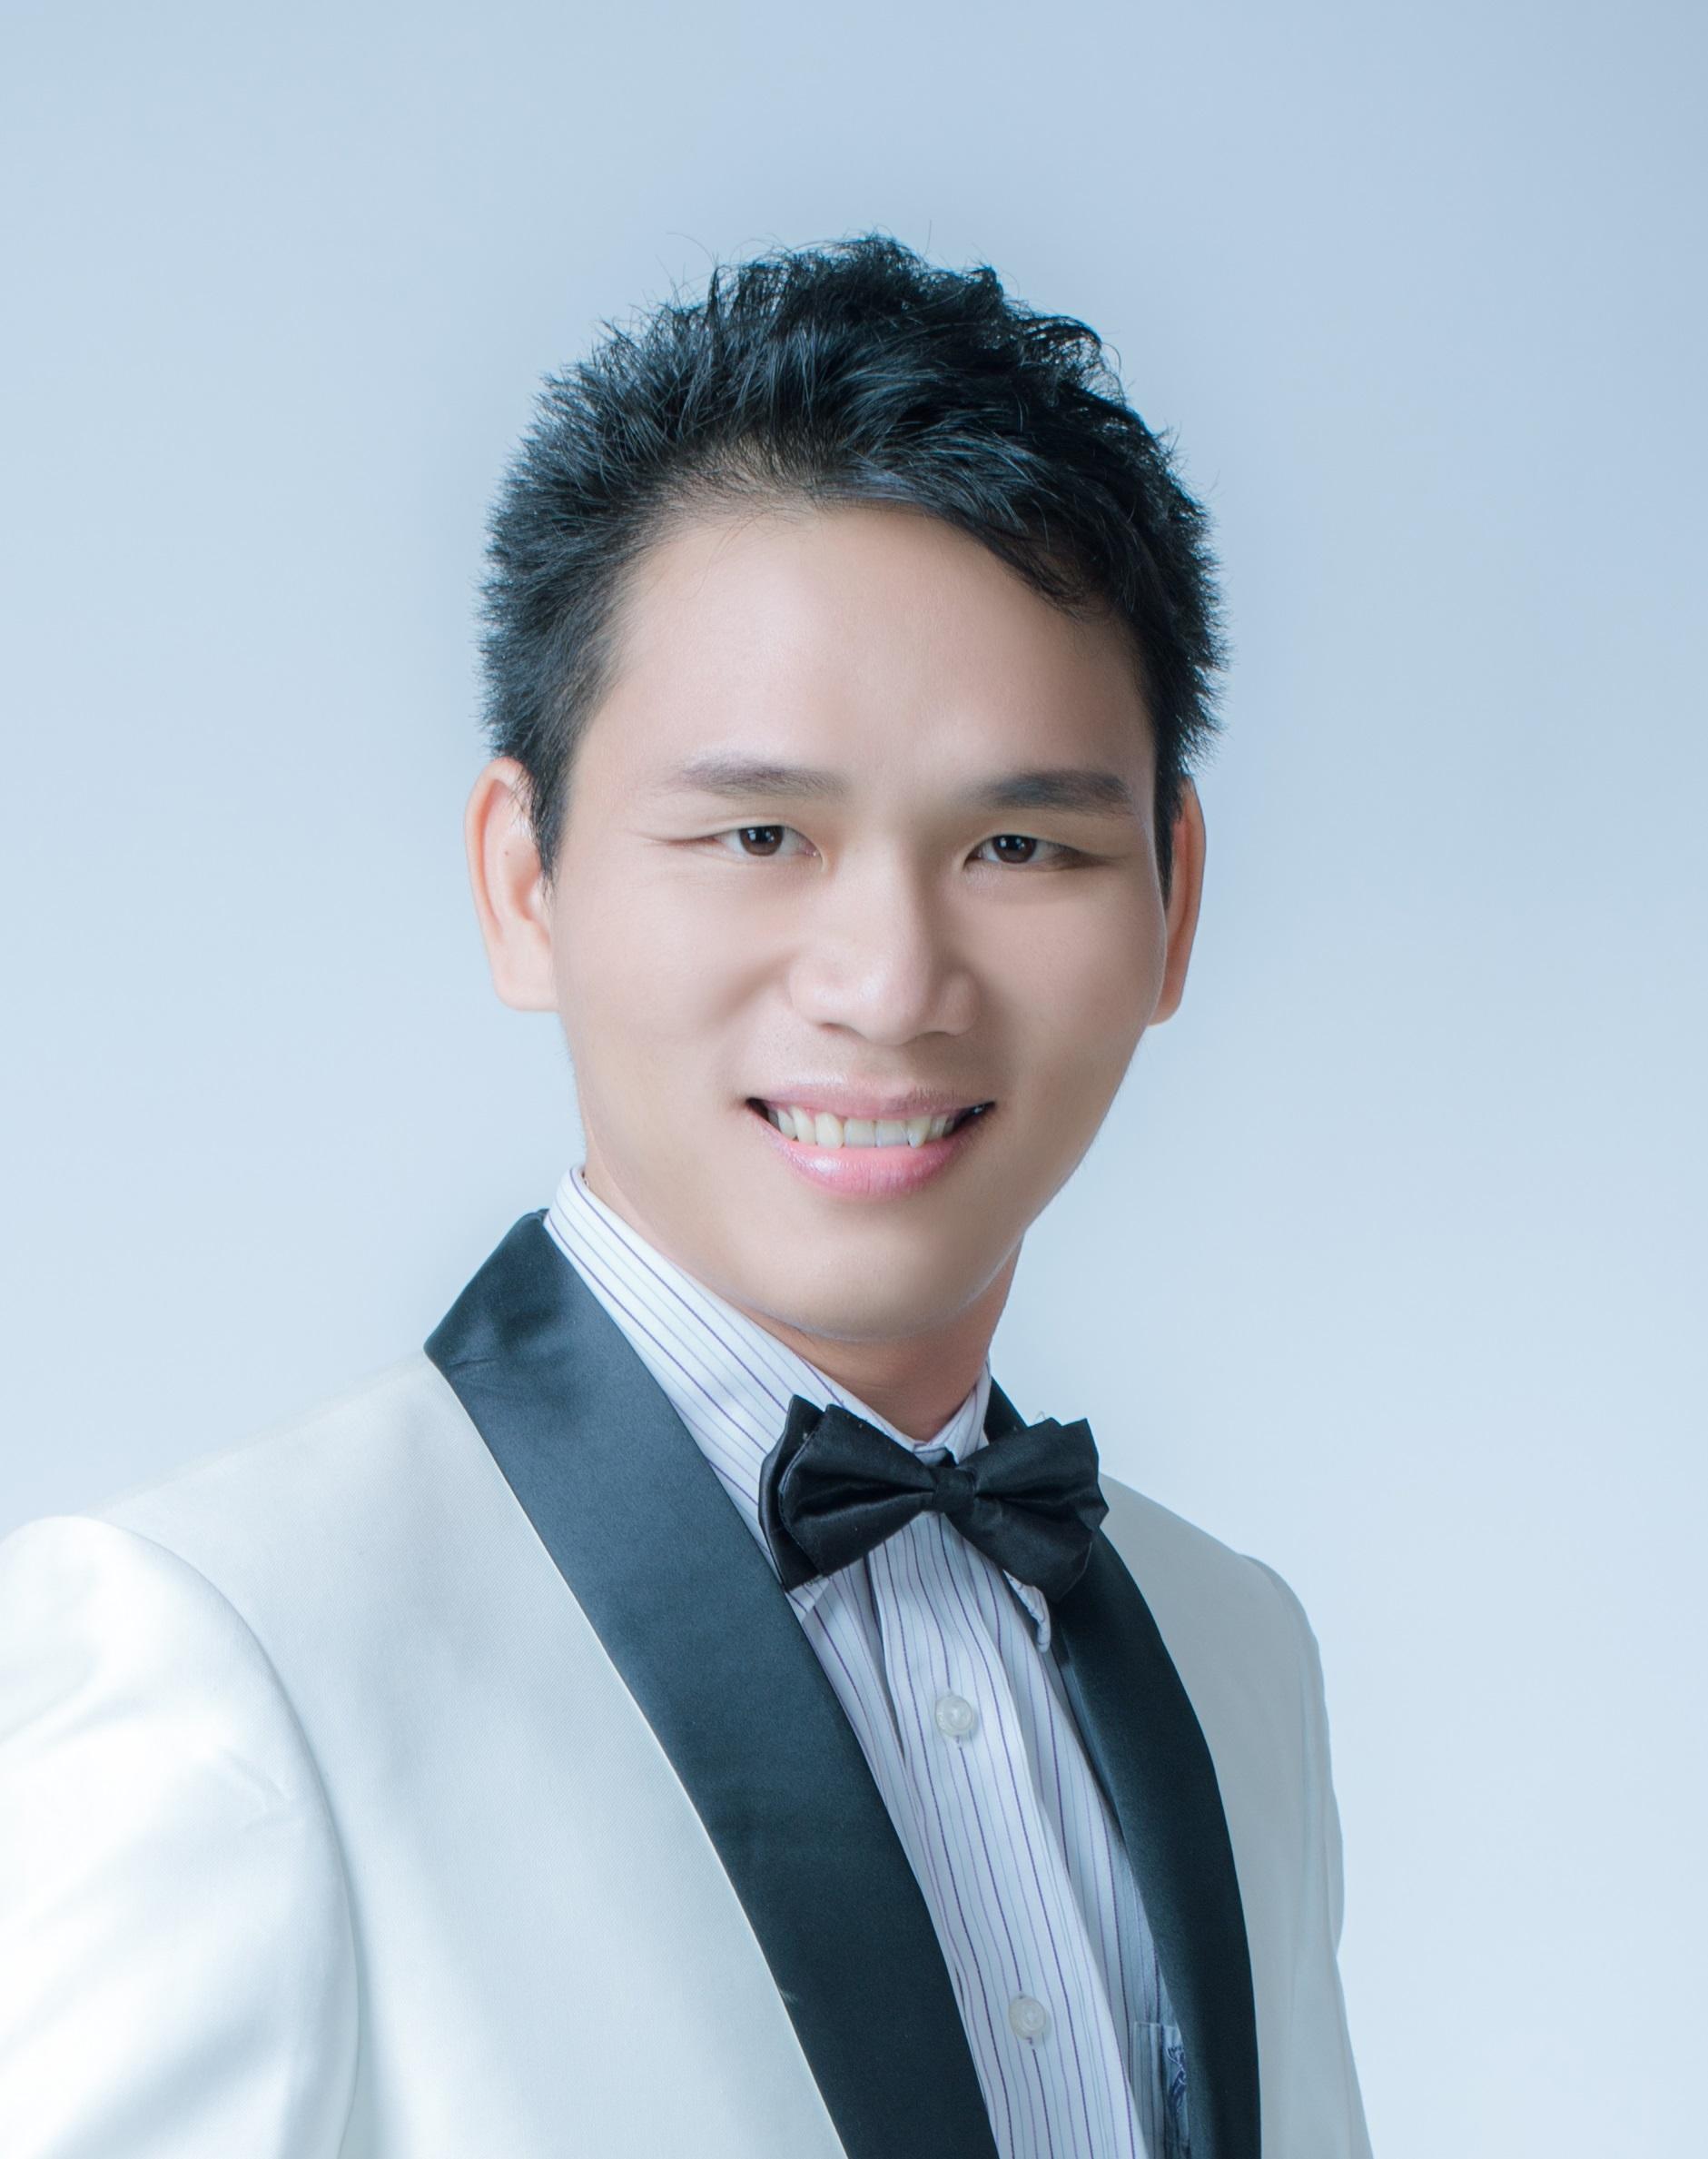 Hong Wai Onn